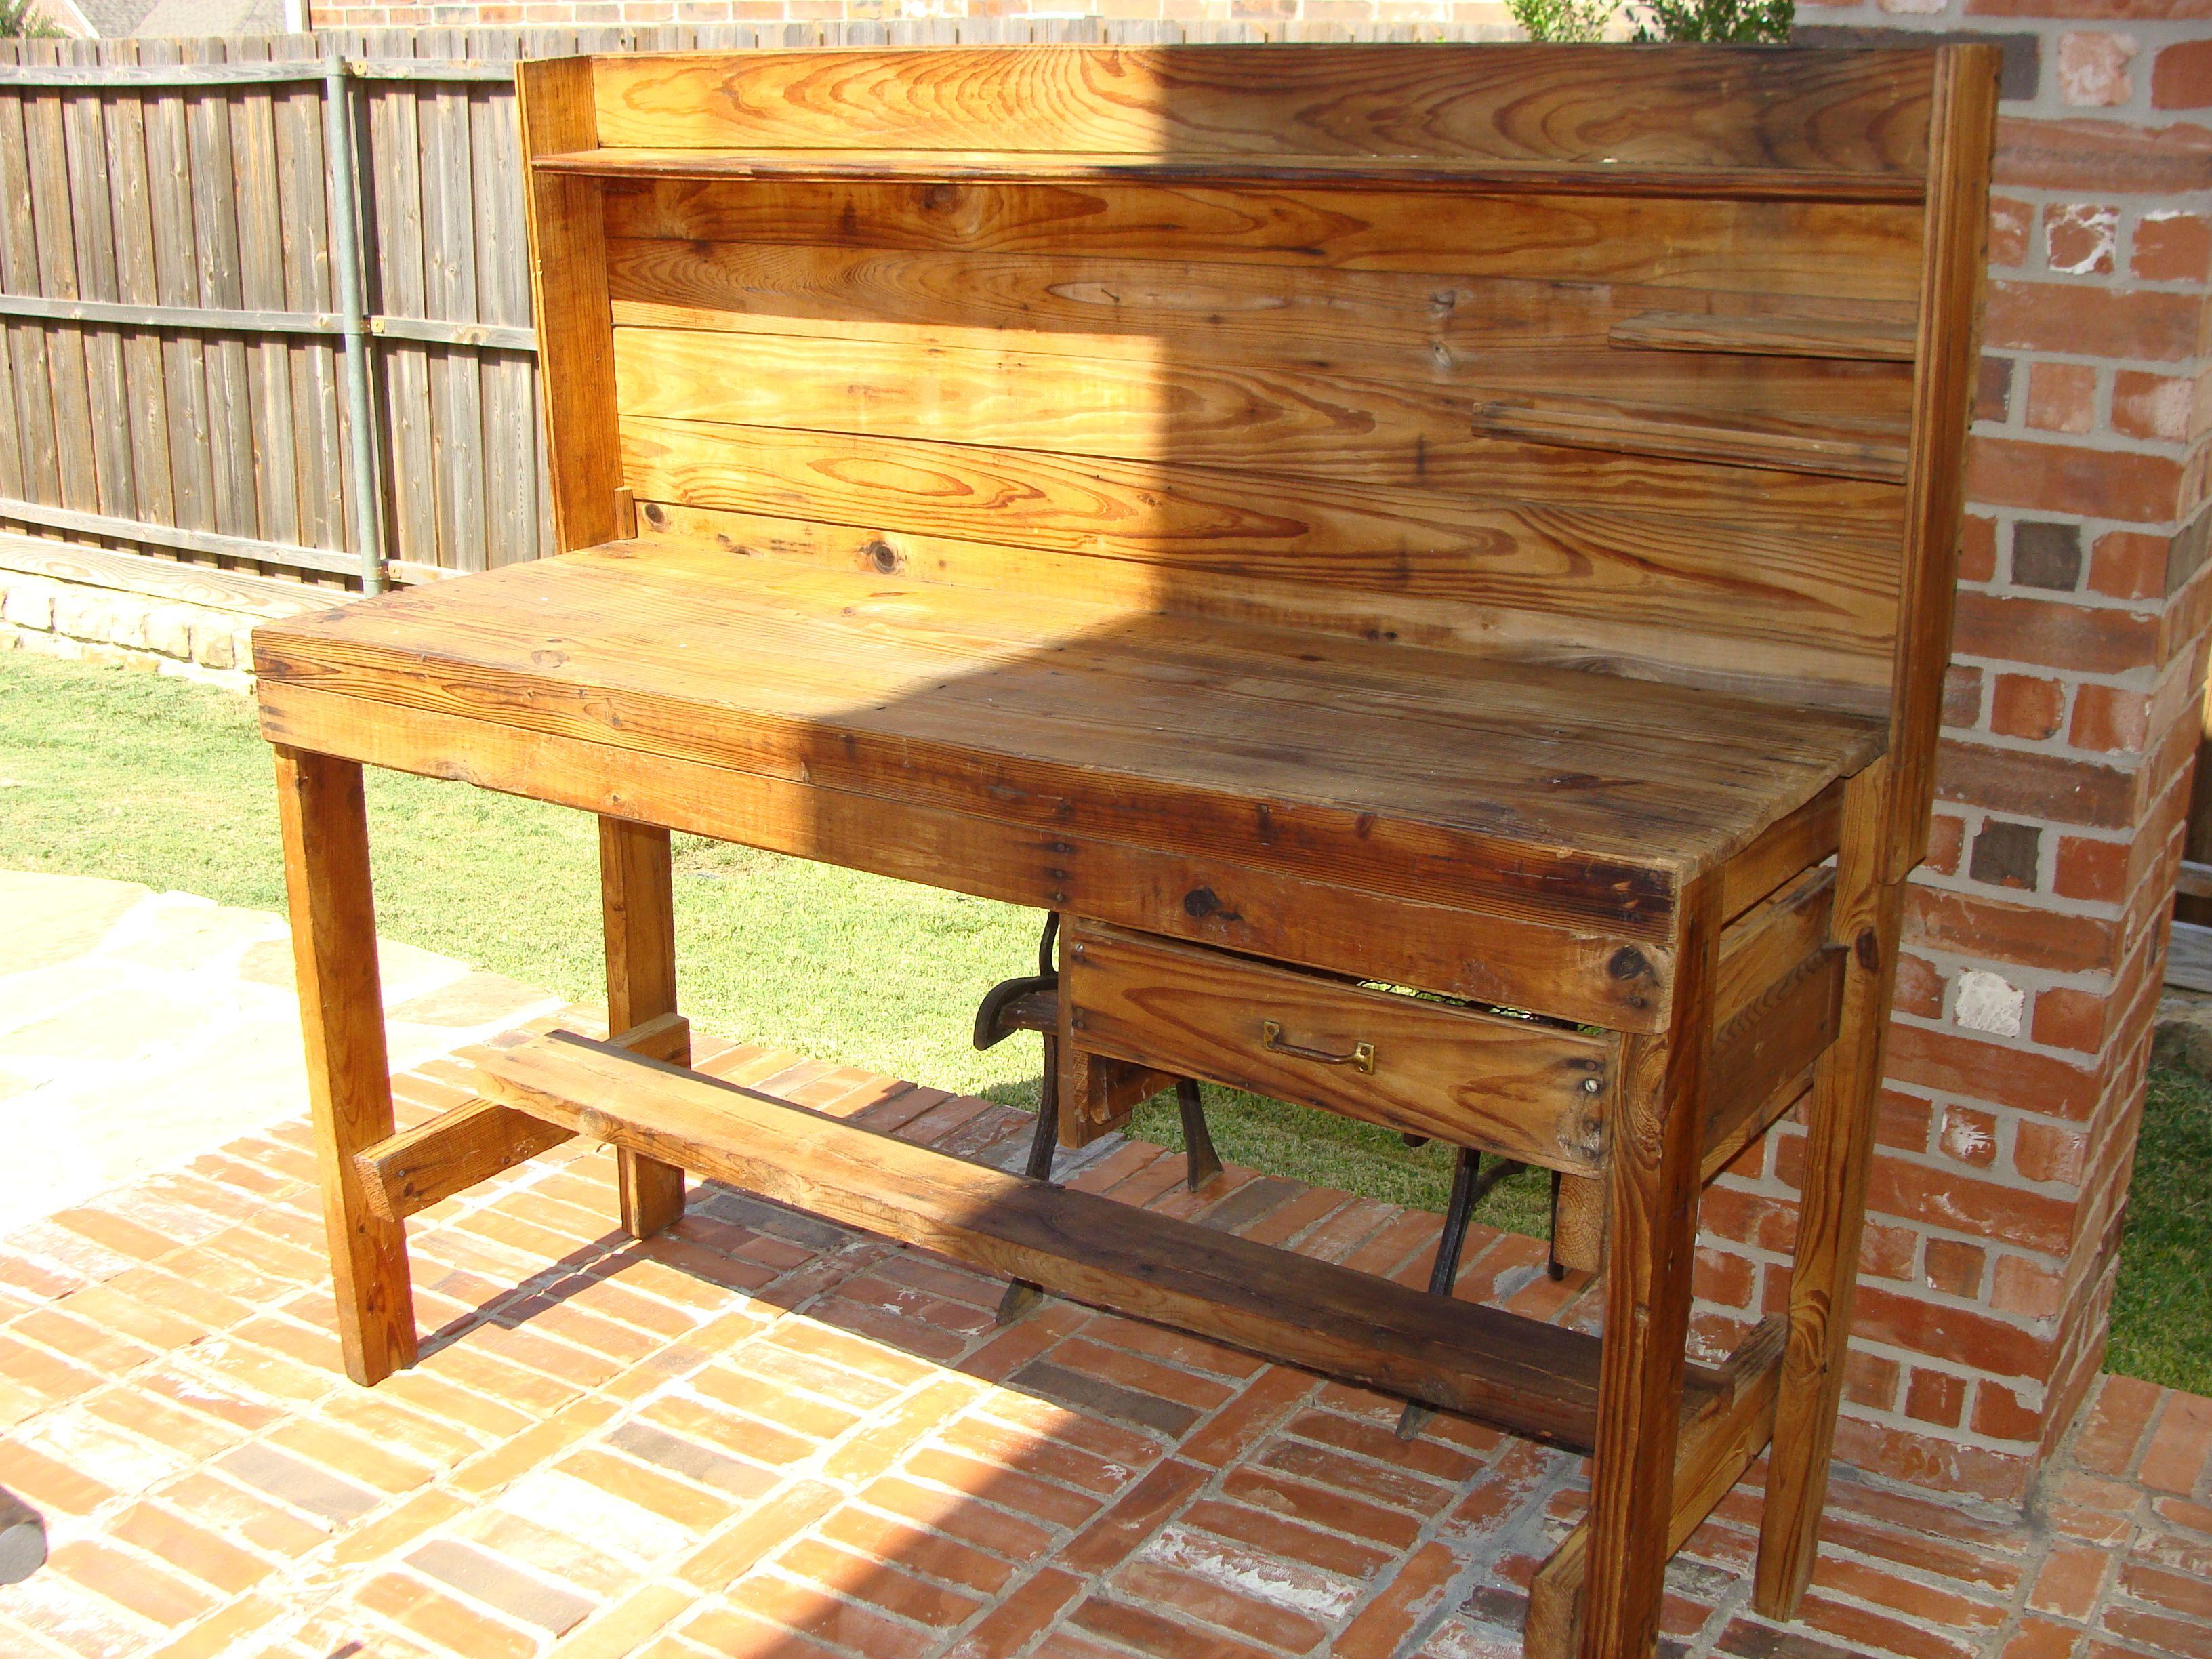 Diy Potting Bench Plans Family Handyman Wooden Pdf